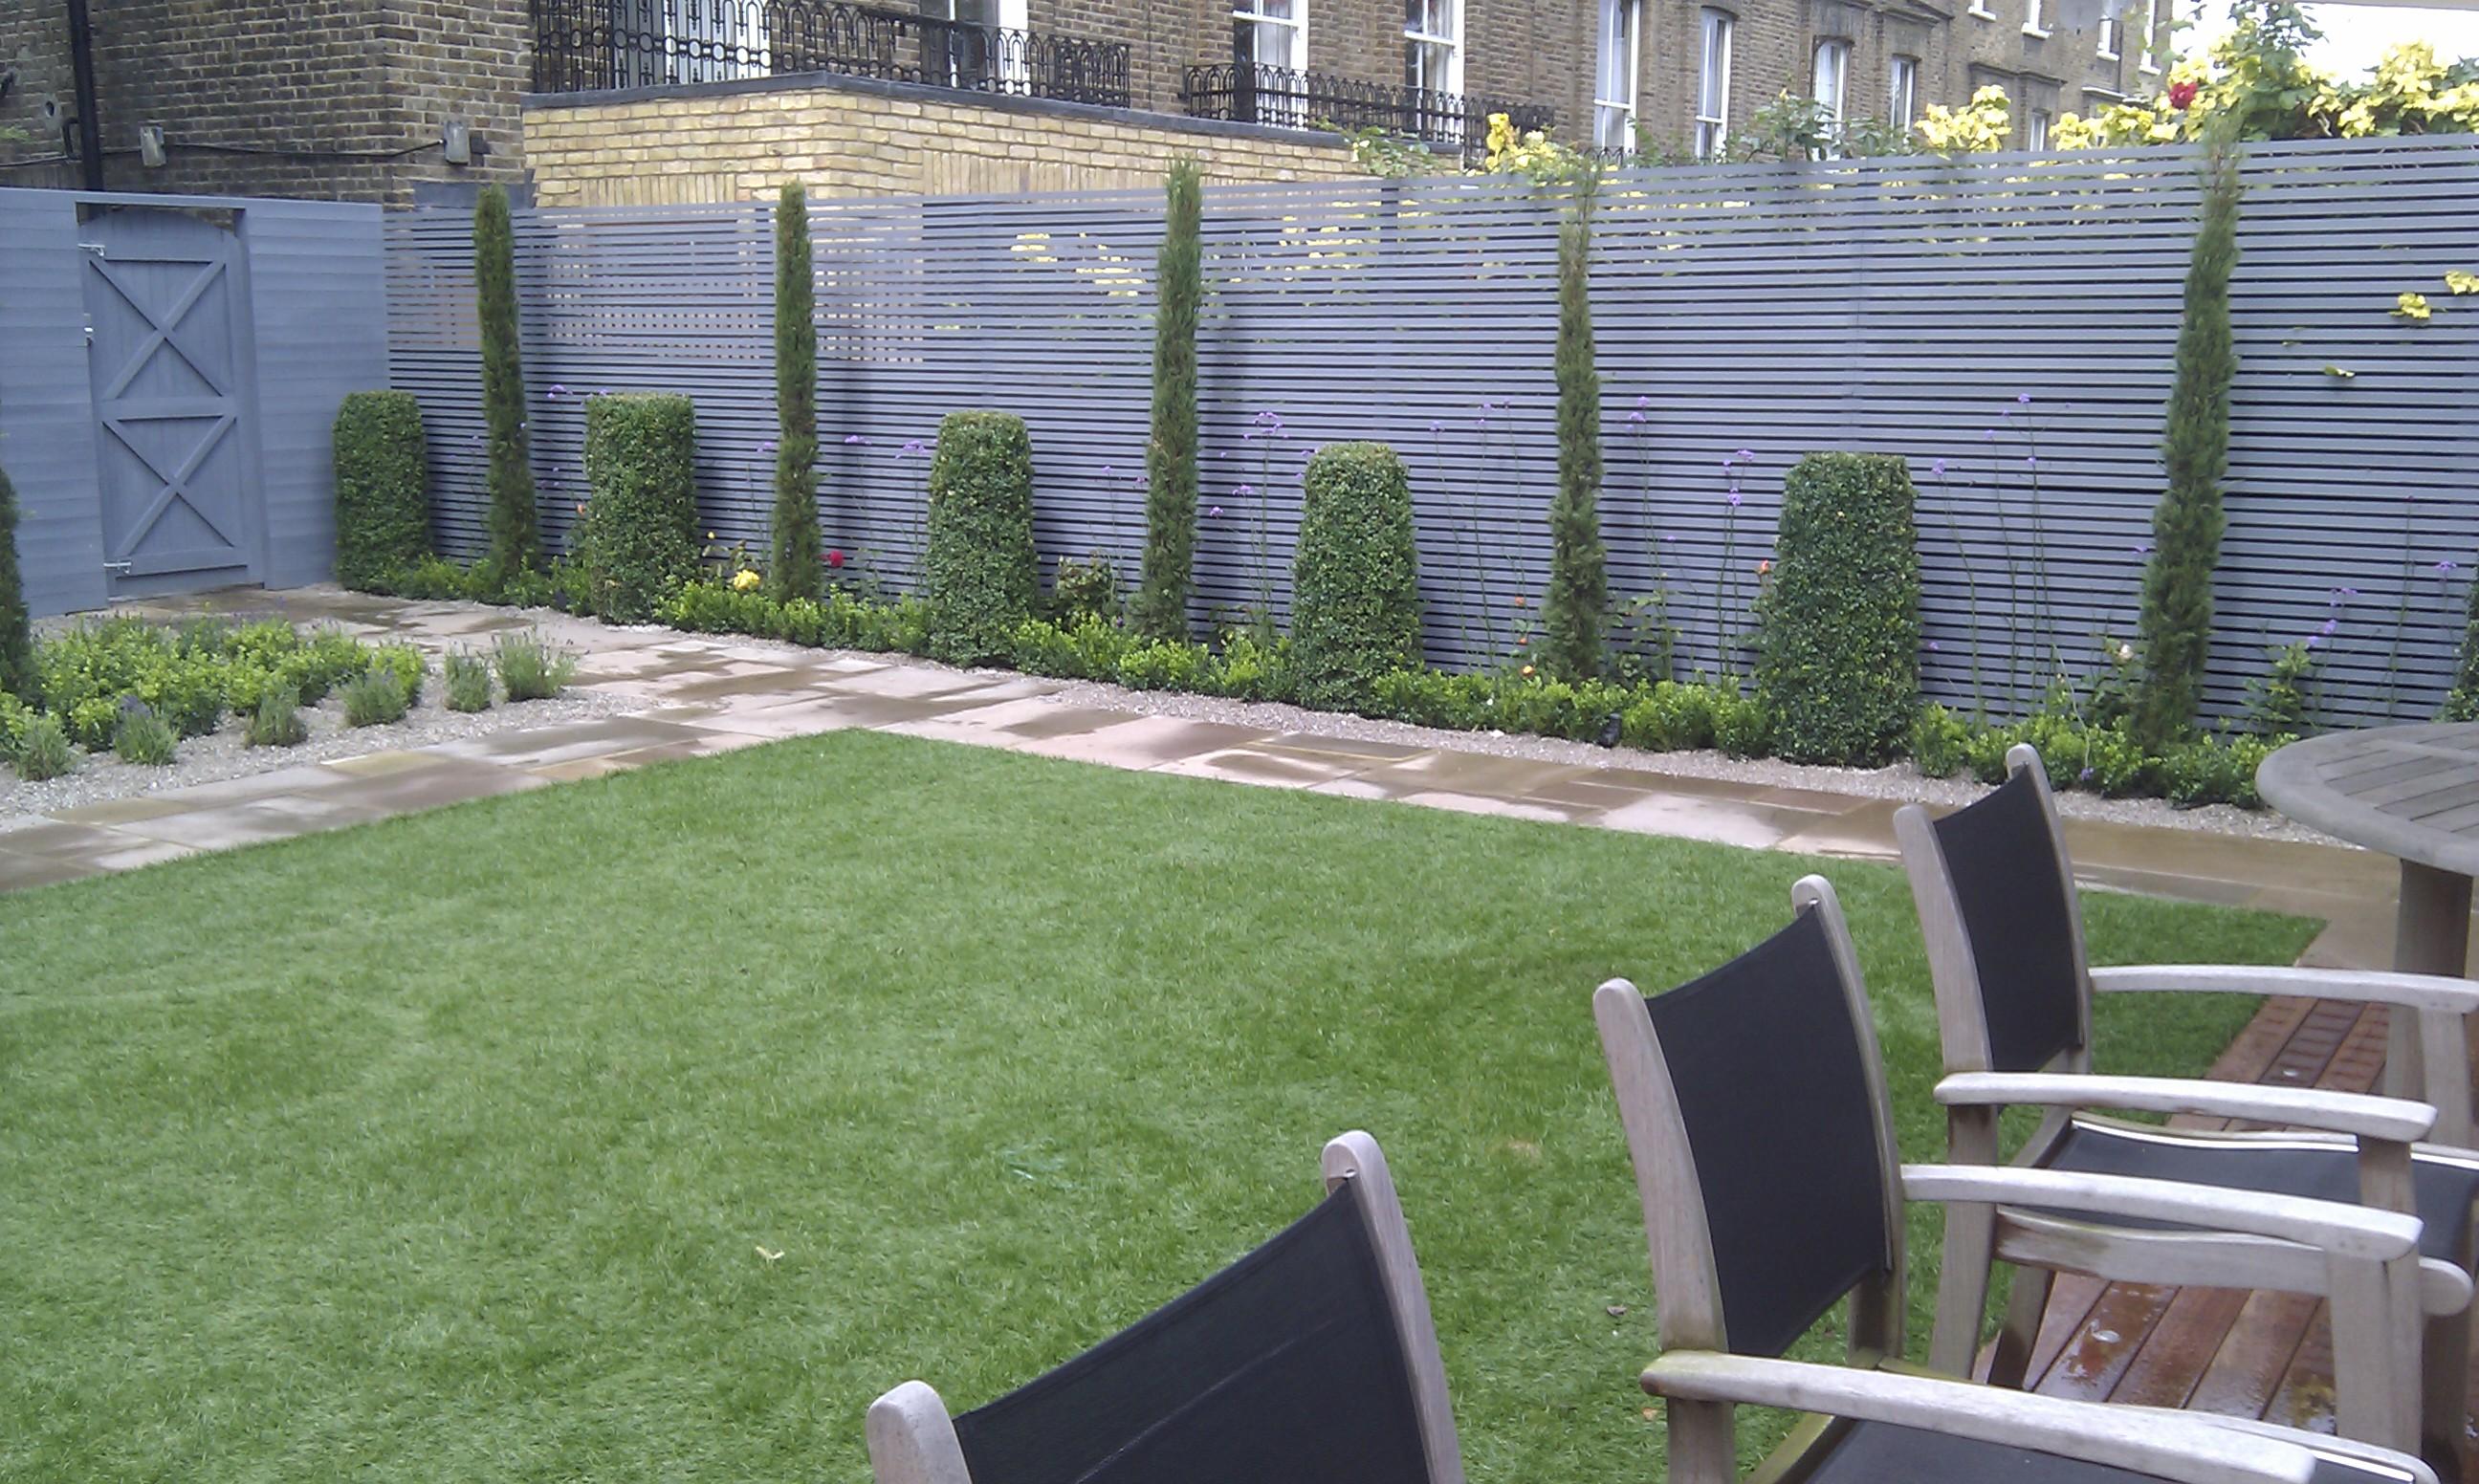 modern garden design london slatted grey privacy screen sandstone paving easy grass balau hardwood decking (9)